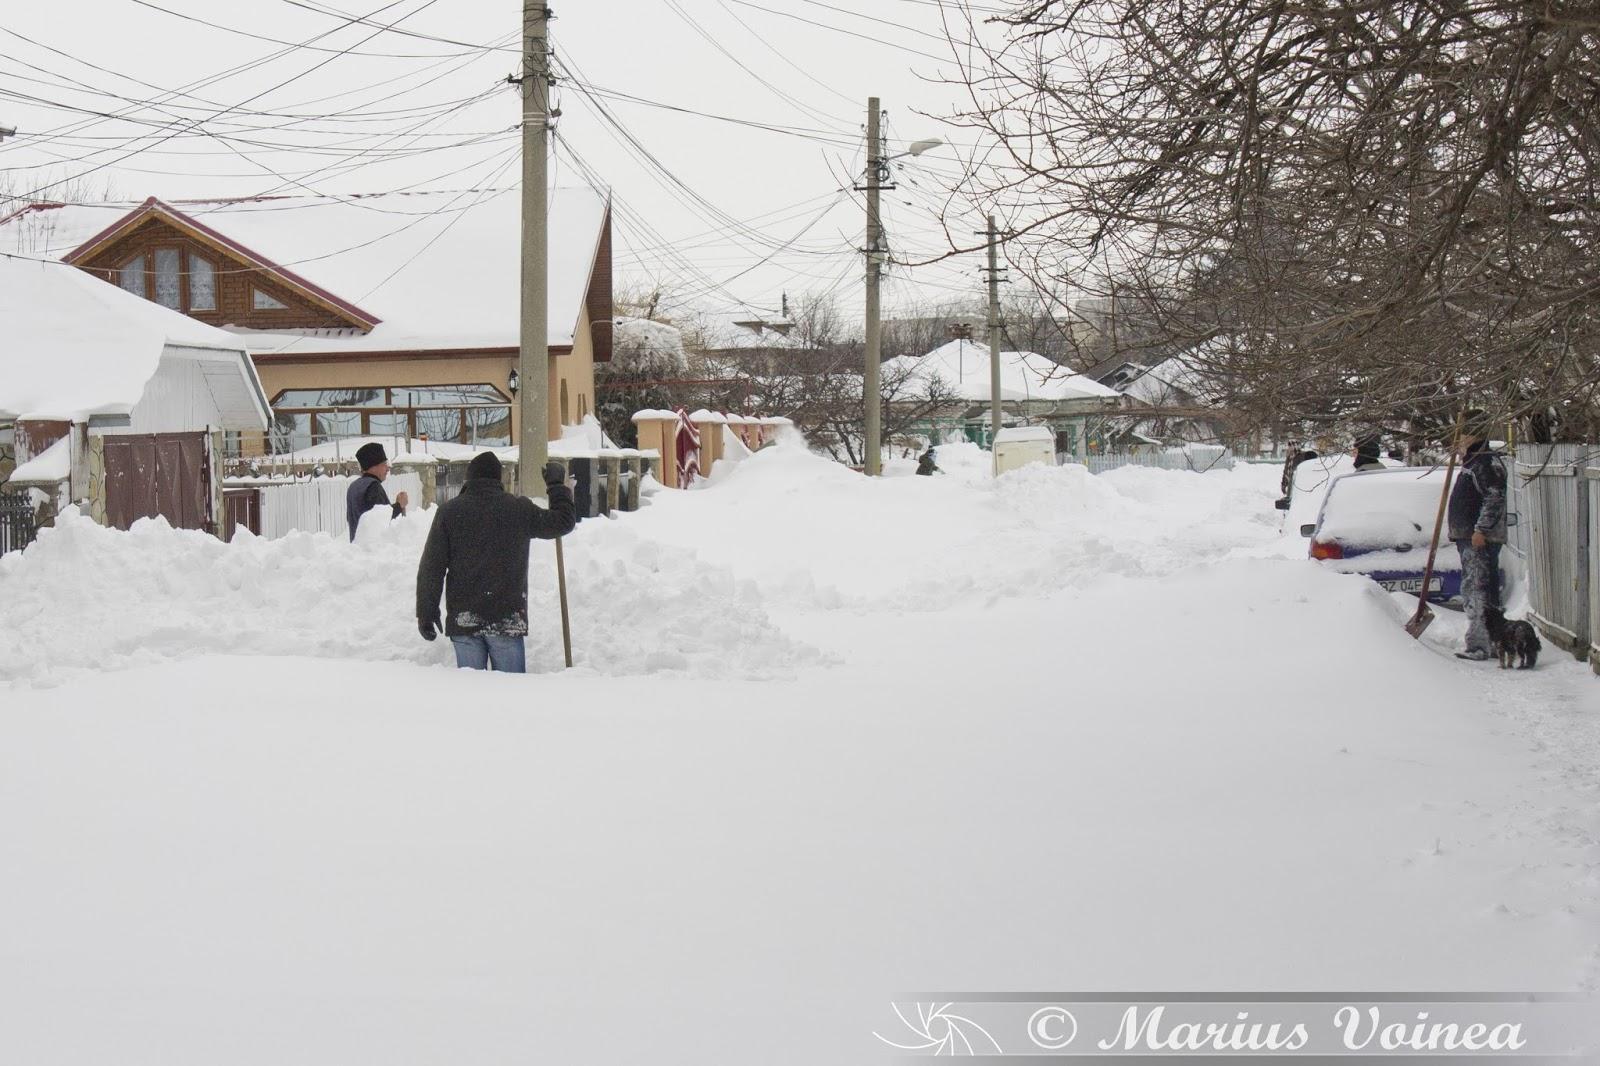 iarna la ramnicu sarat, 2014 foto 5